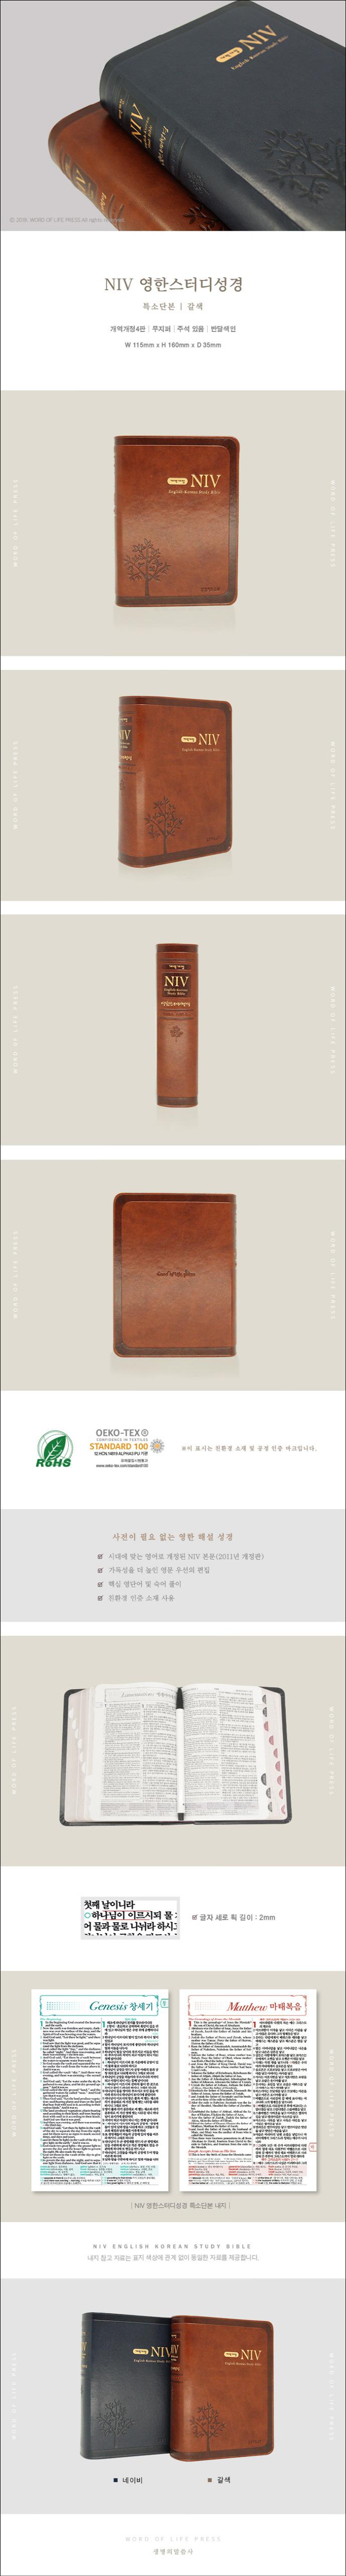 NIV 영한 스터디 성경(갈색)(특소단본)(색인)(무지퍼)(개역개정) 도서 상세이미지